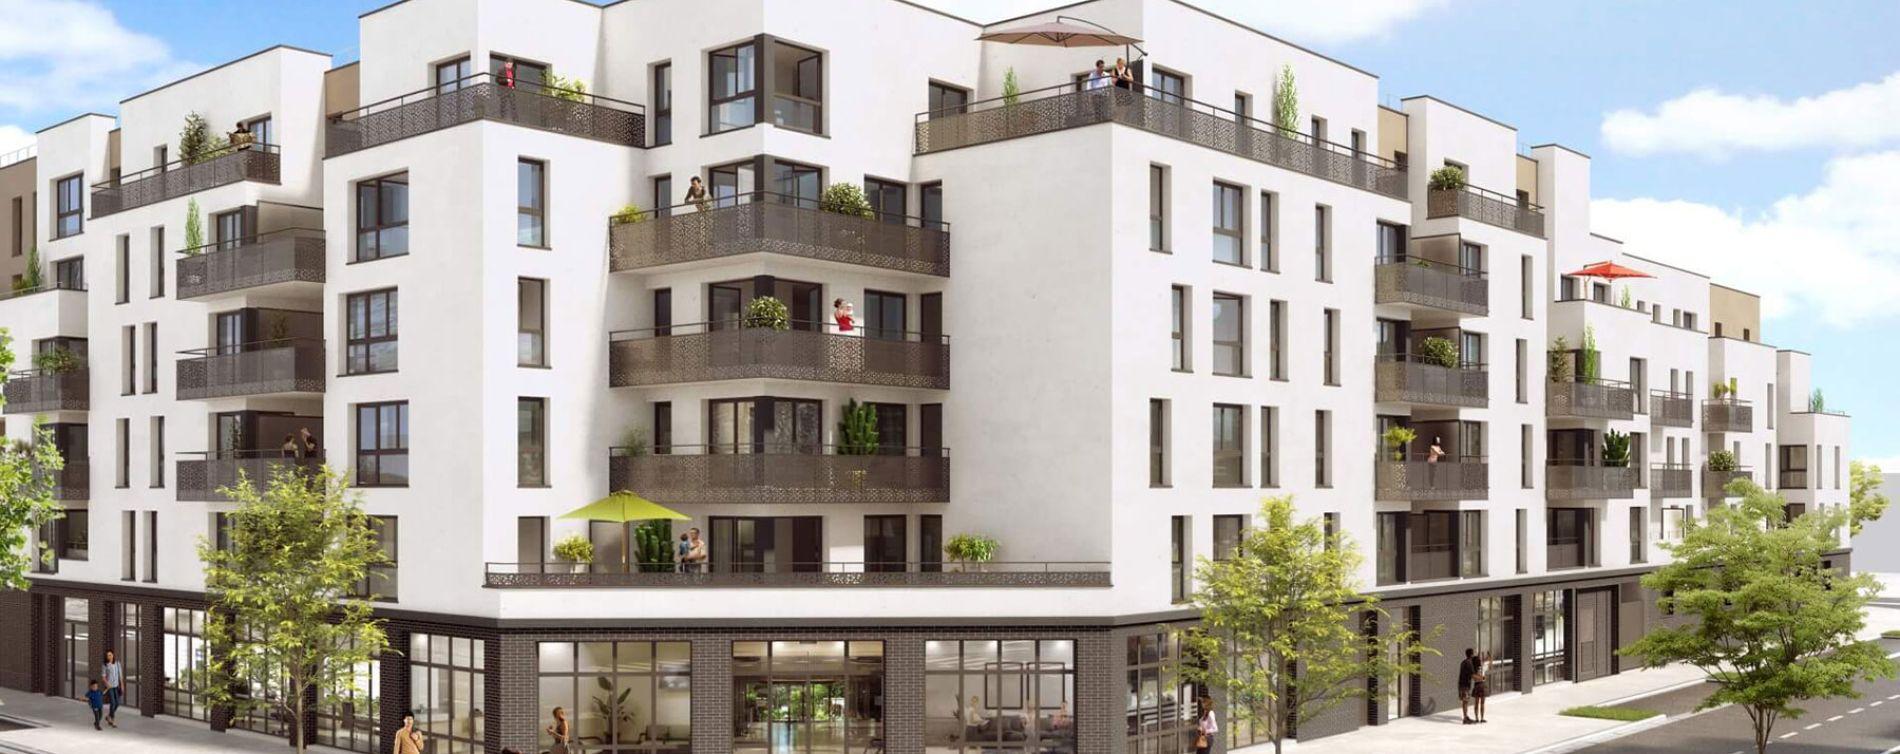 Résidence New Villa Genottes à Cergy